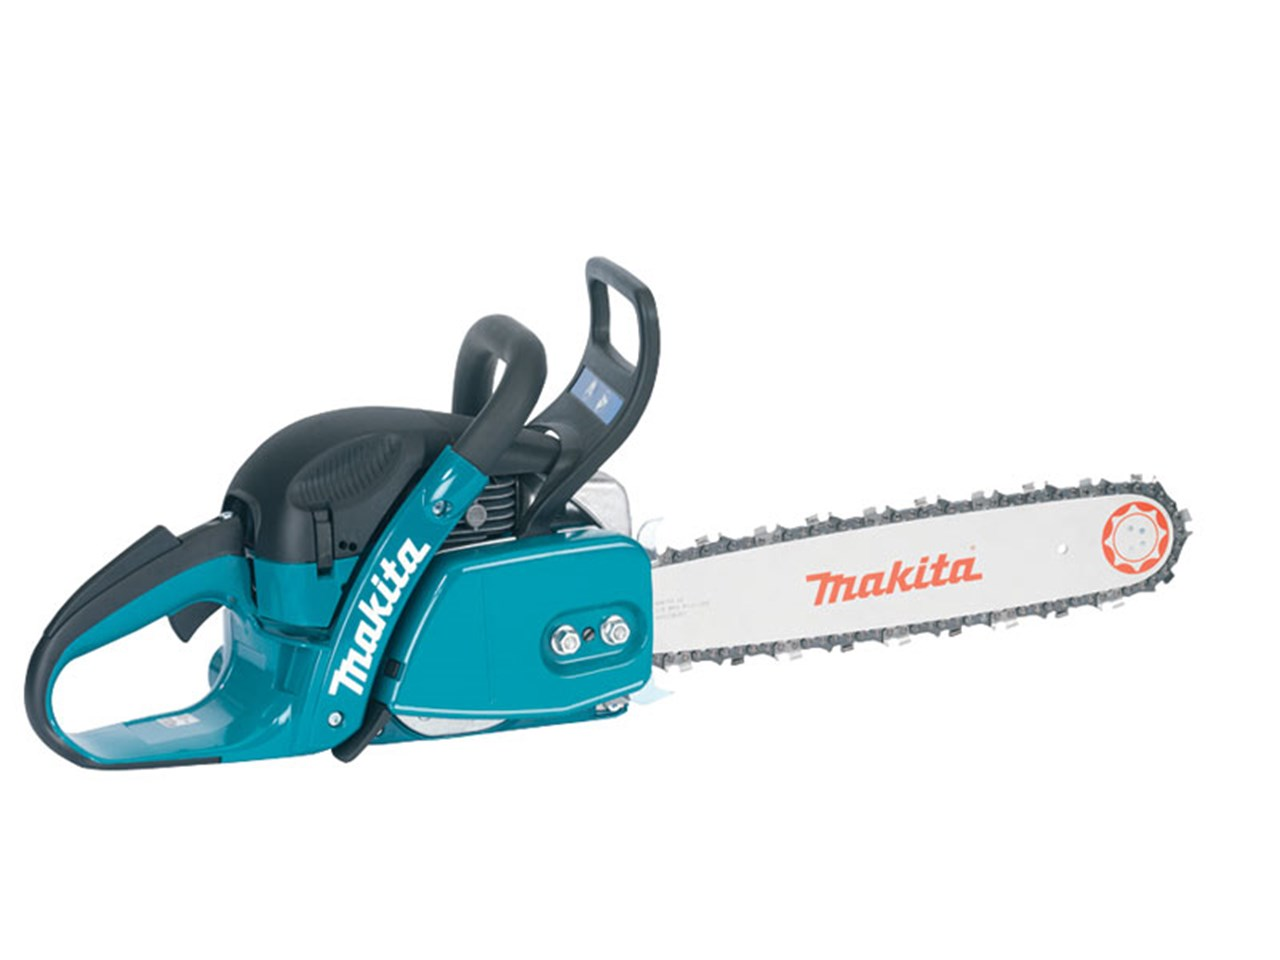 Makita EA5000P45D 50cc 2-Stroke Petrol Chainsaw 45cm Bar